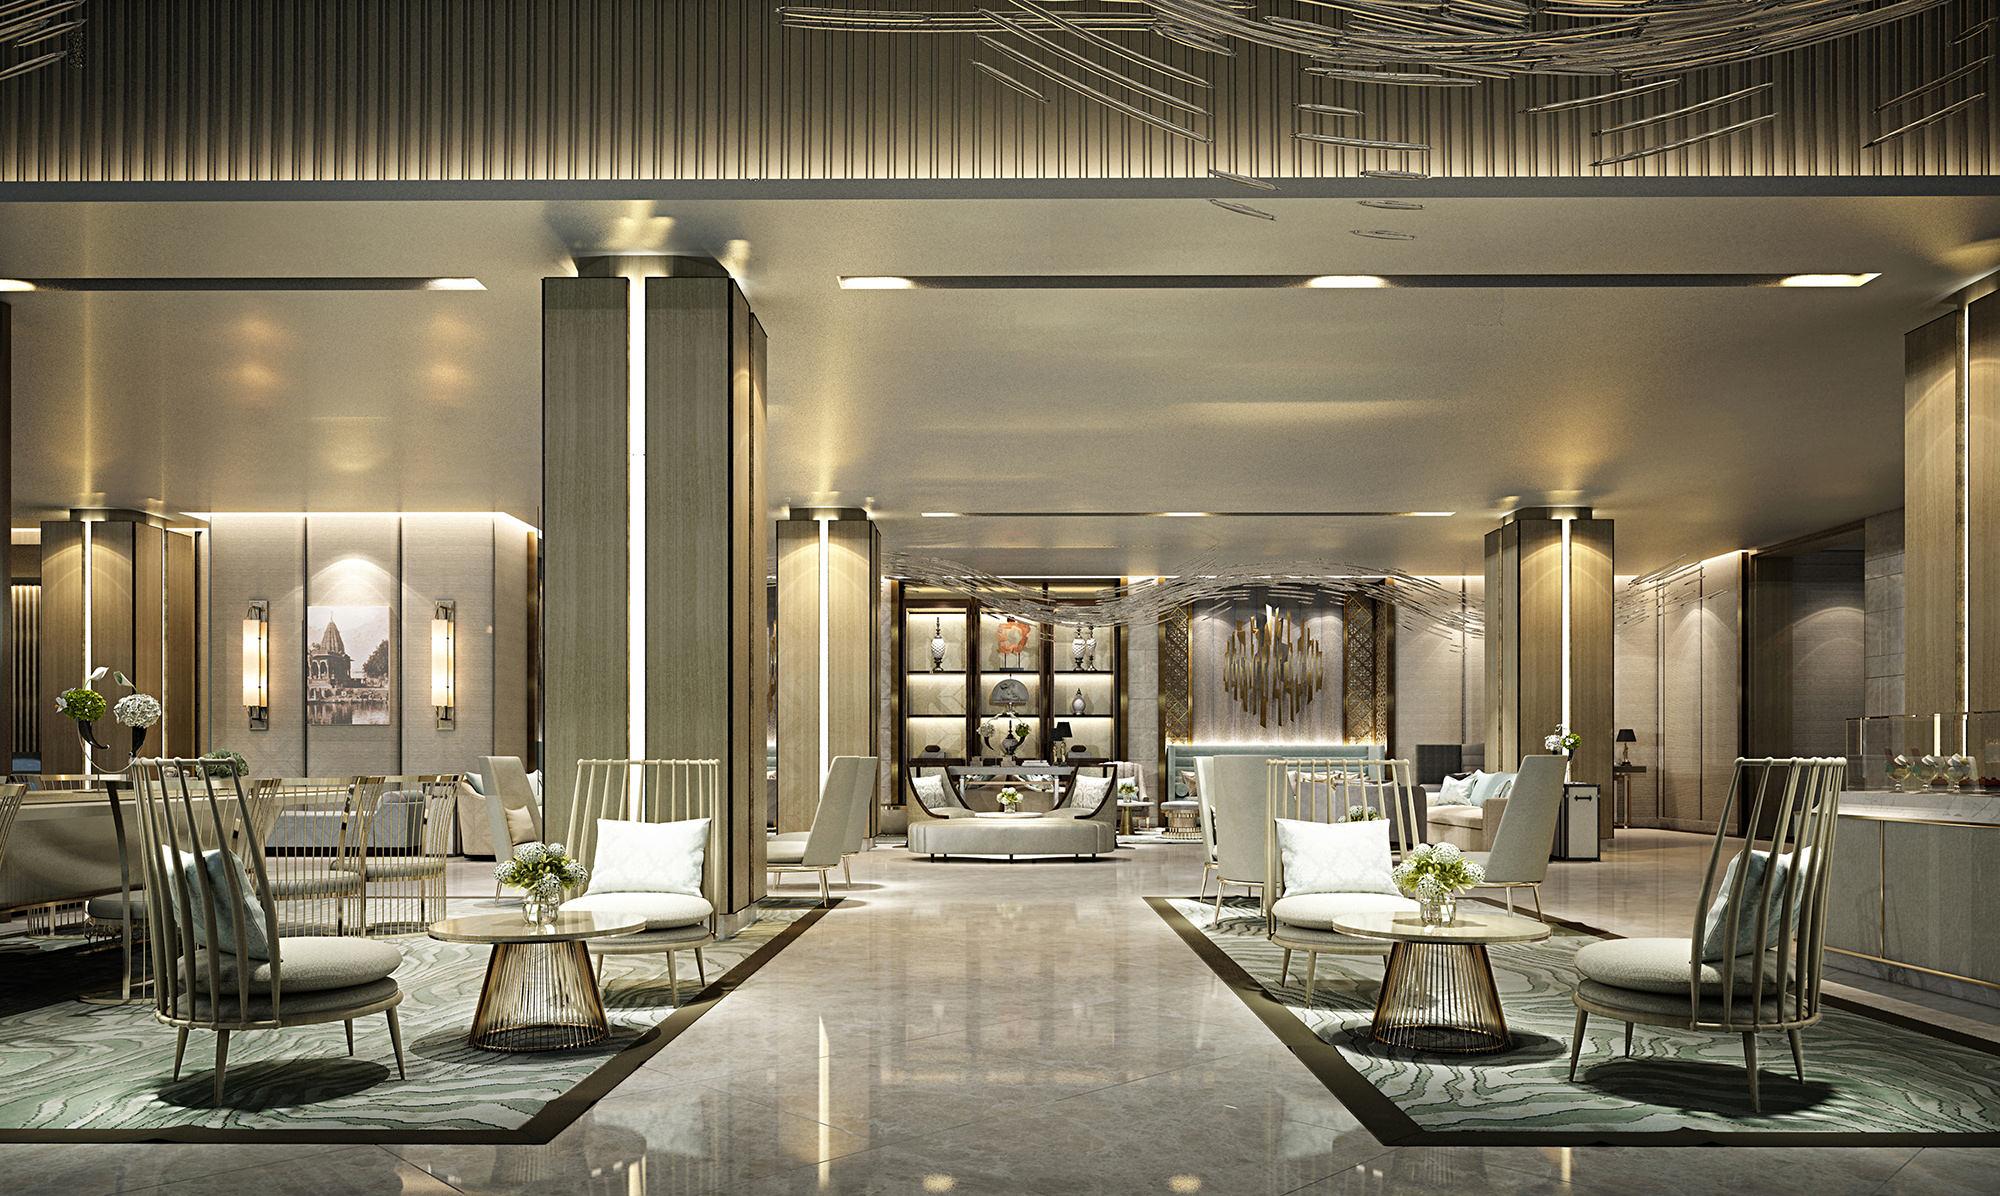 Lobby | Photo Credit: Indore Marriott Hotel